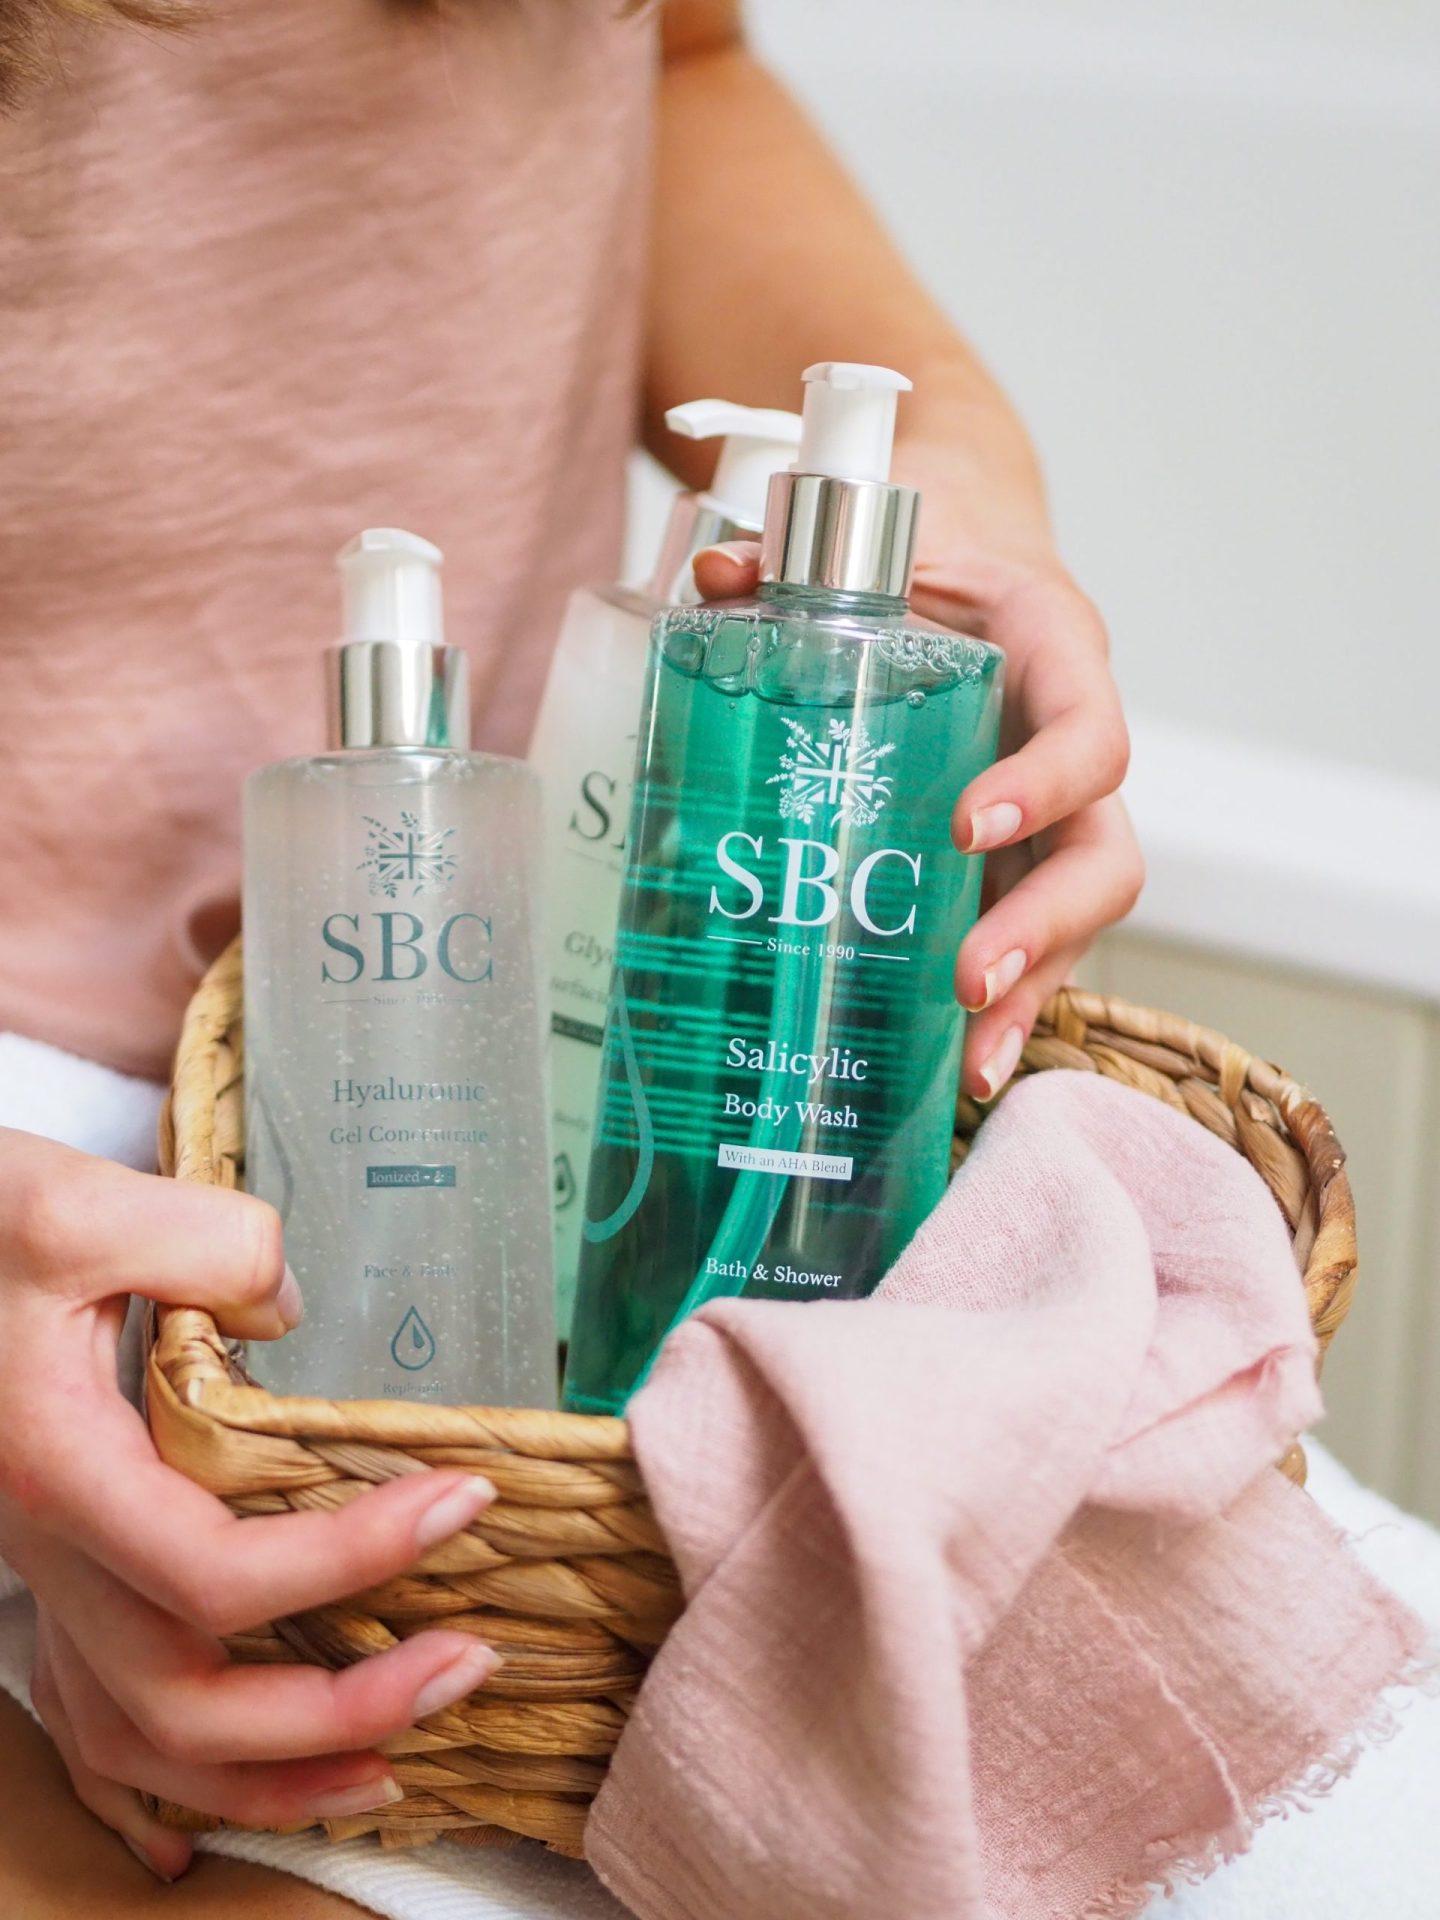 SBC new body acid trio